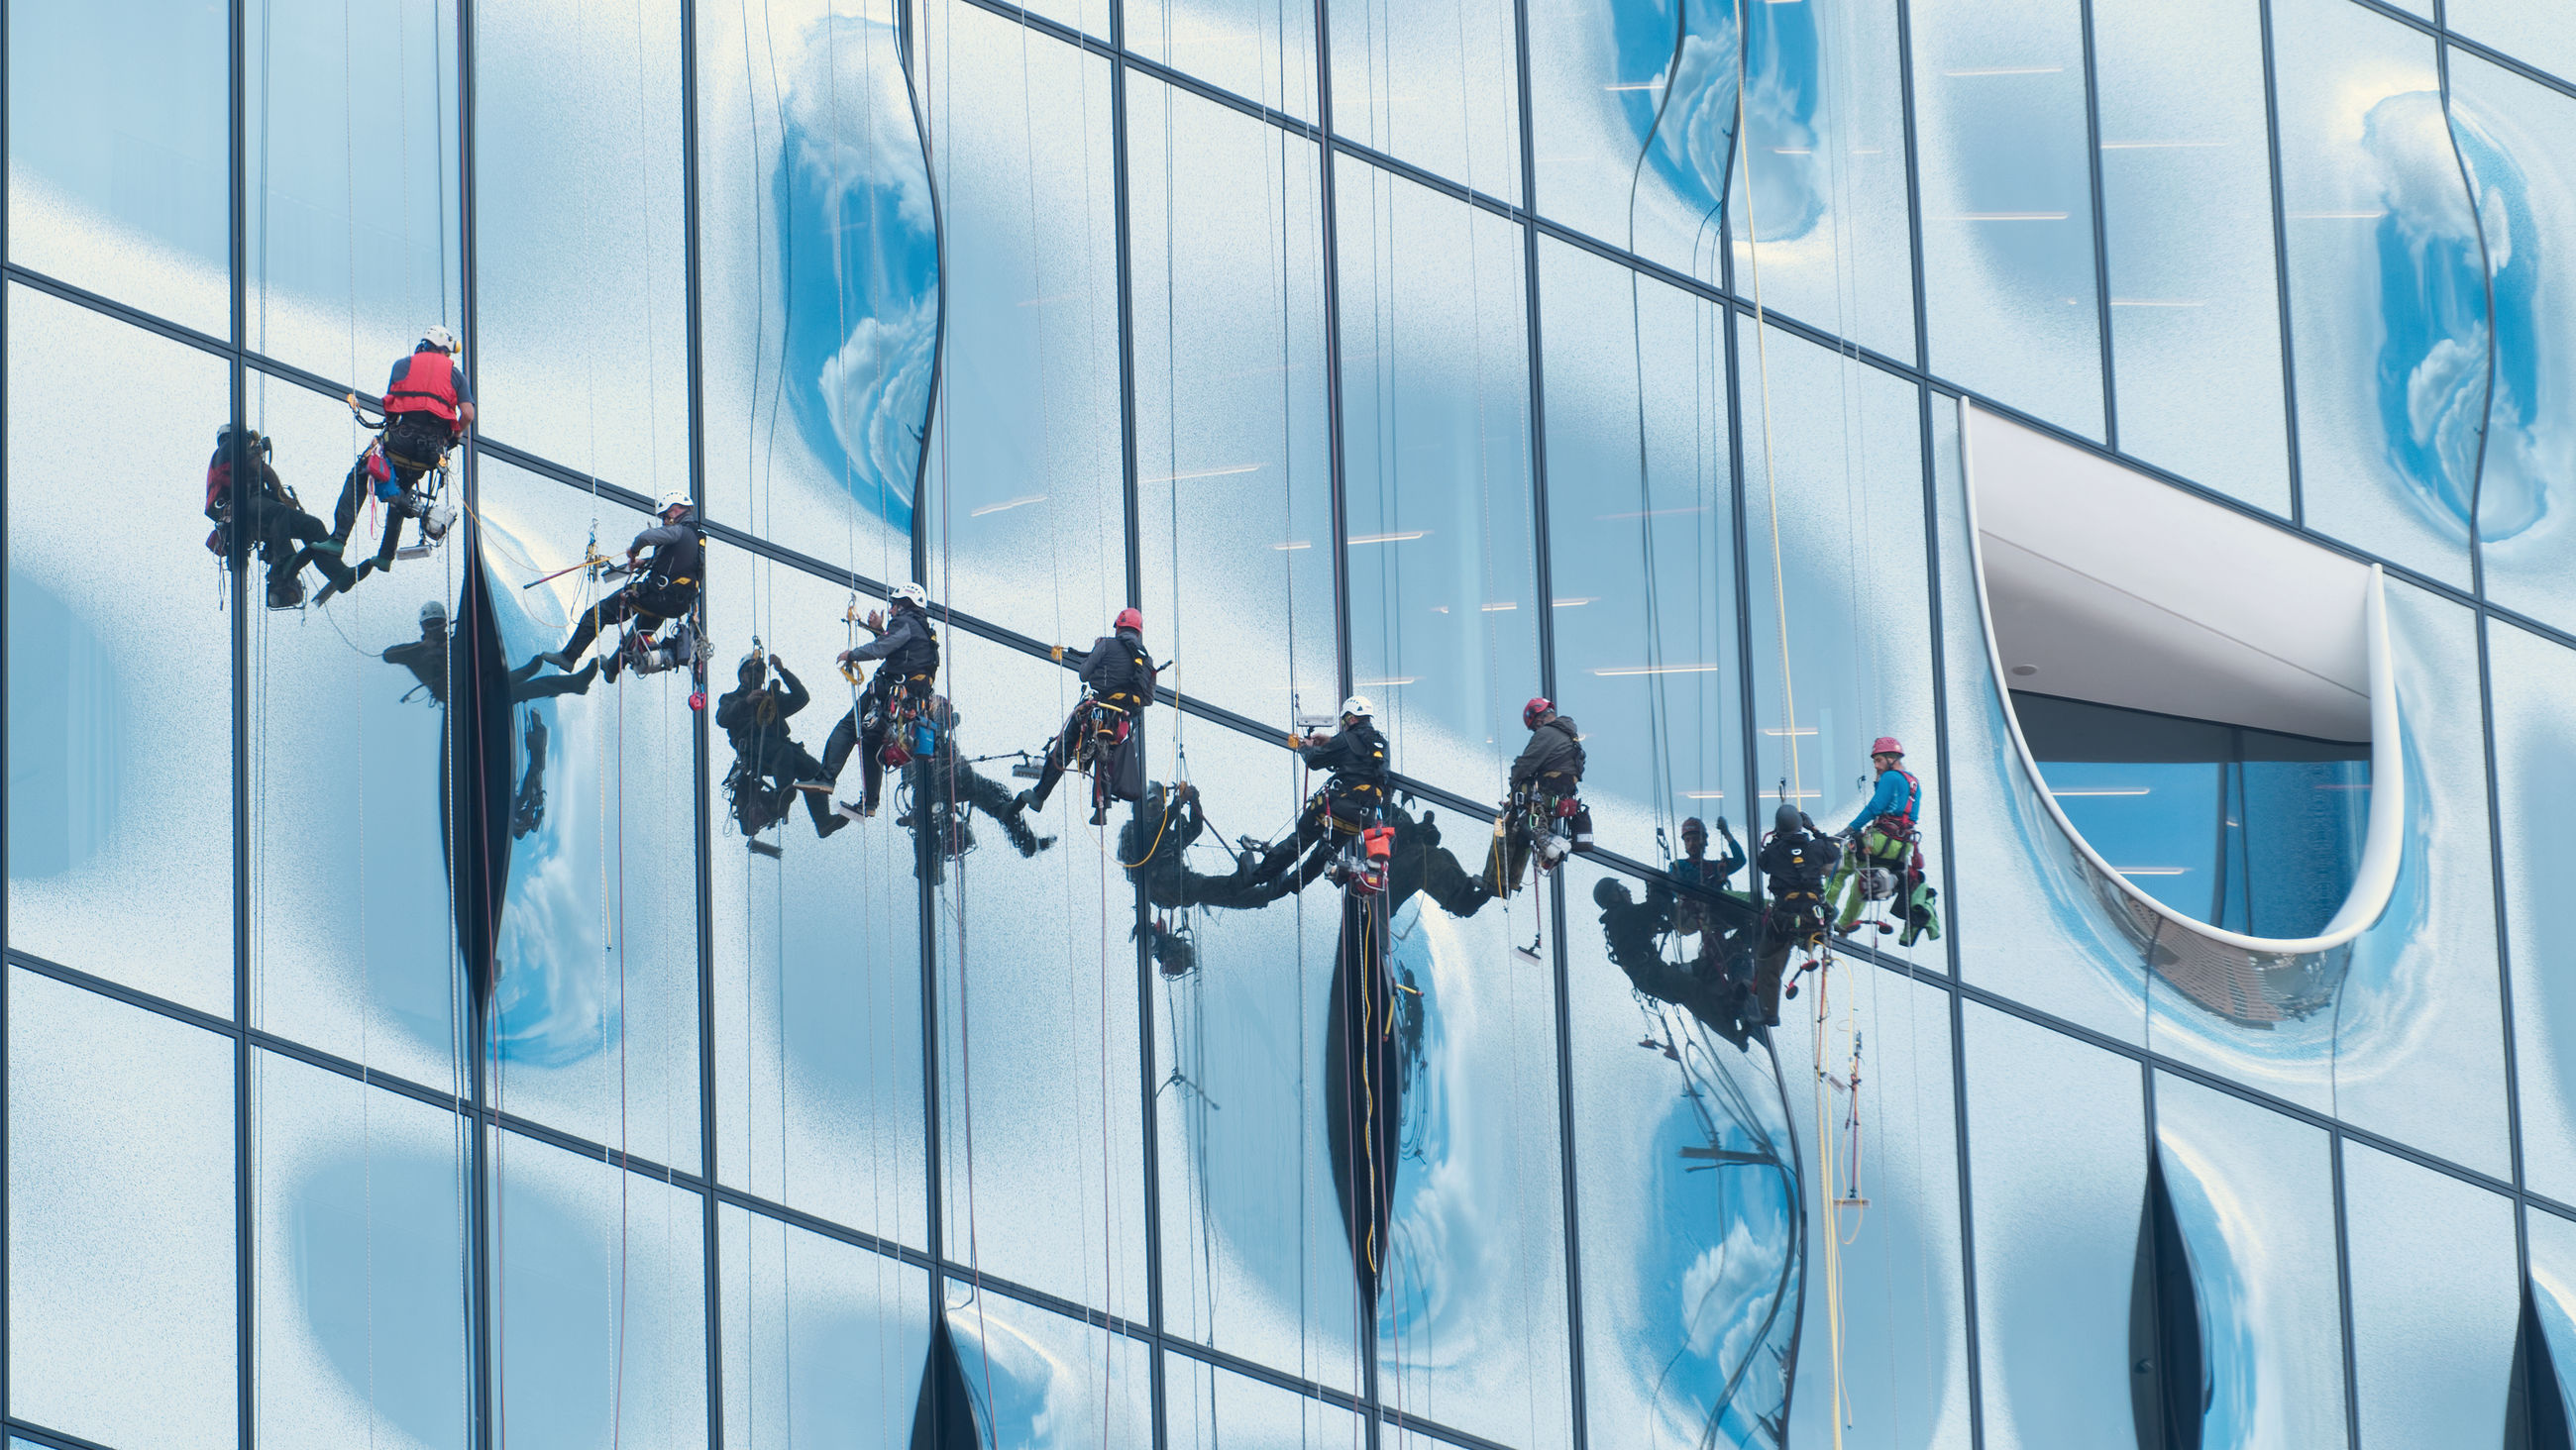 LOW ANGLE VIEW OF MODERN GLASS WINDOW